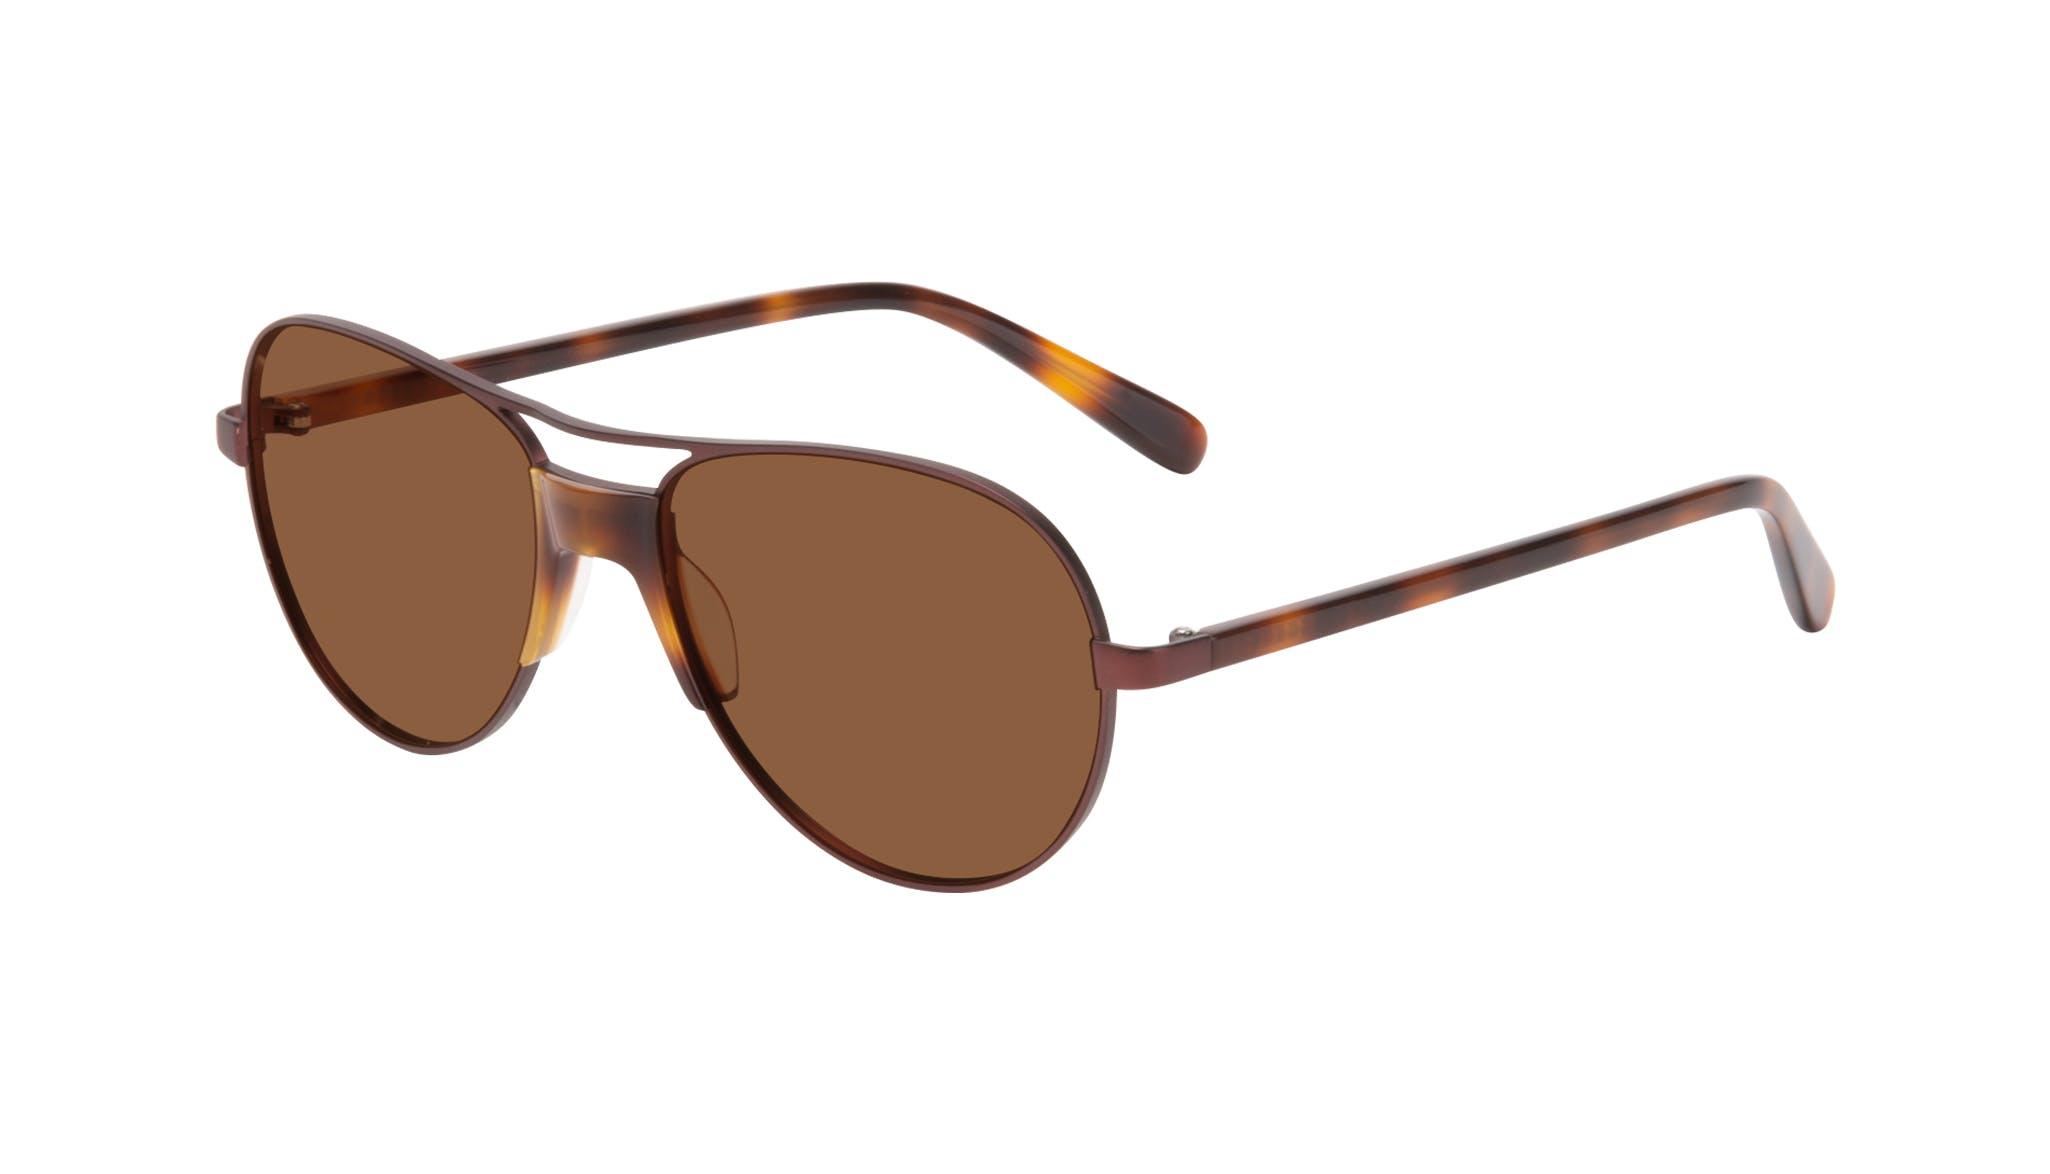 Affordable Fashion Glasses Aviator Sunglasses Women Ultimate Wine Tilt